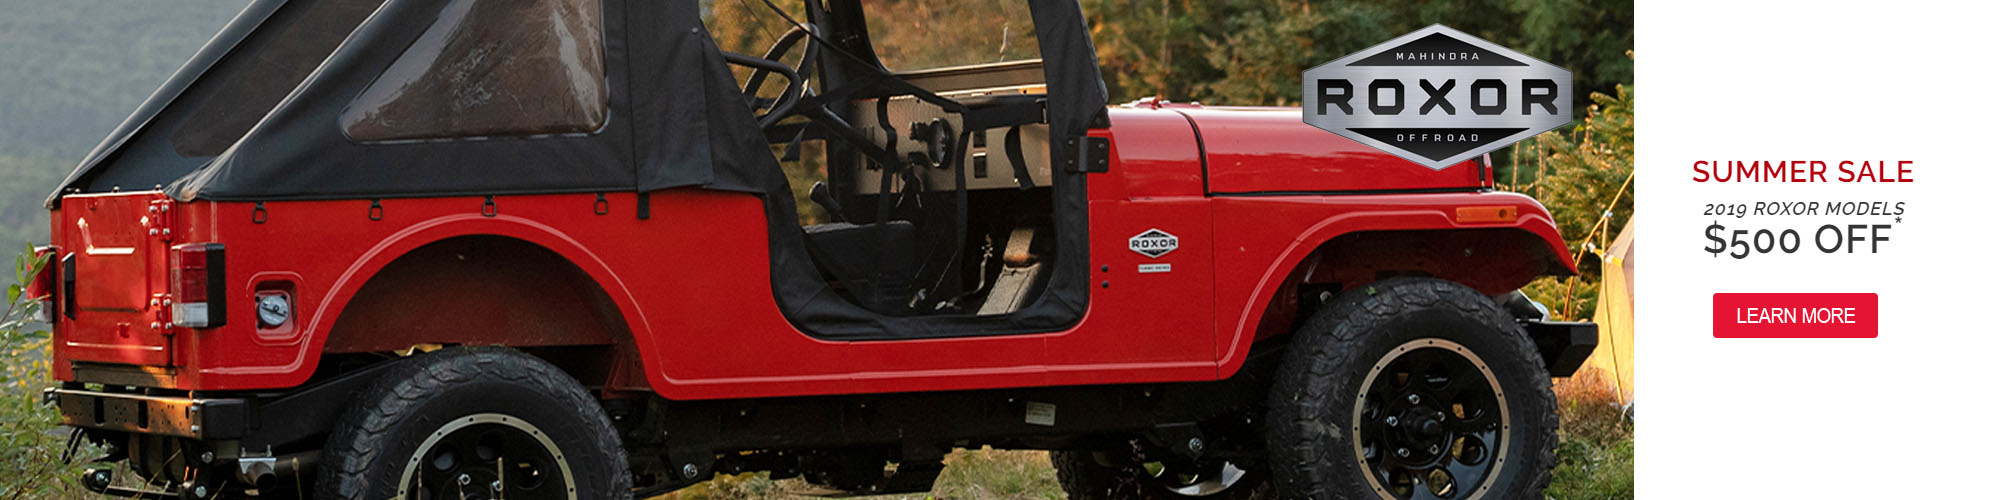 Riderz   Yellowhead County, AB   New & Pre-Owned ATVs, UTVs, Dirt